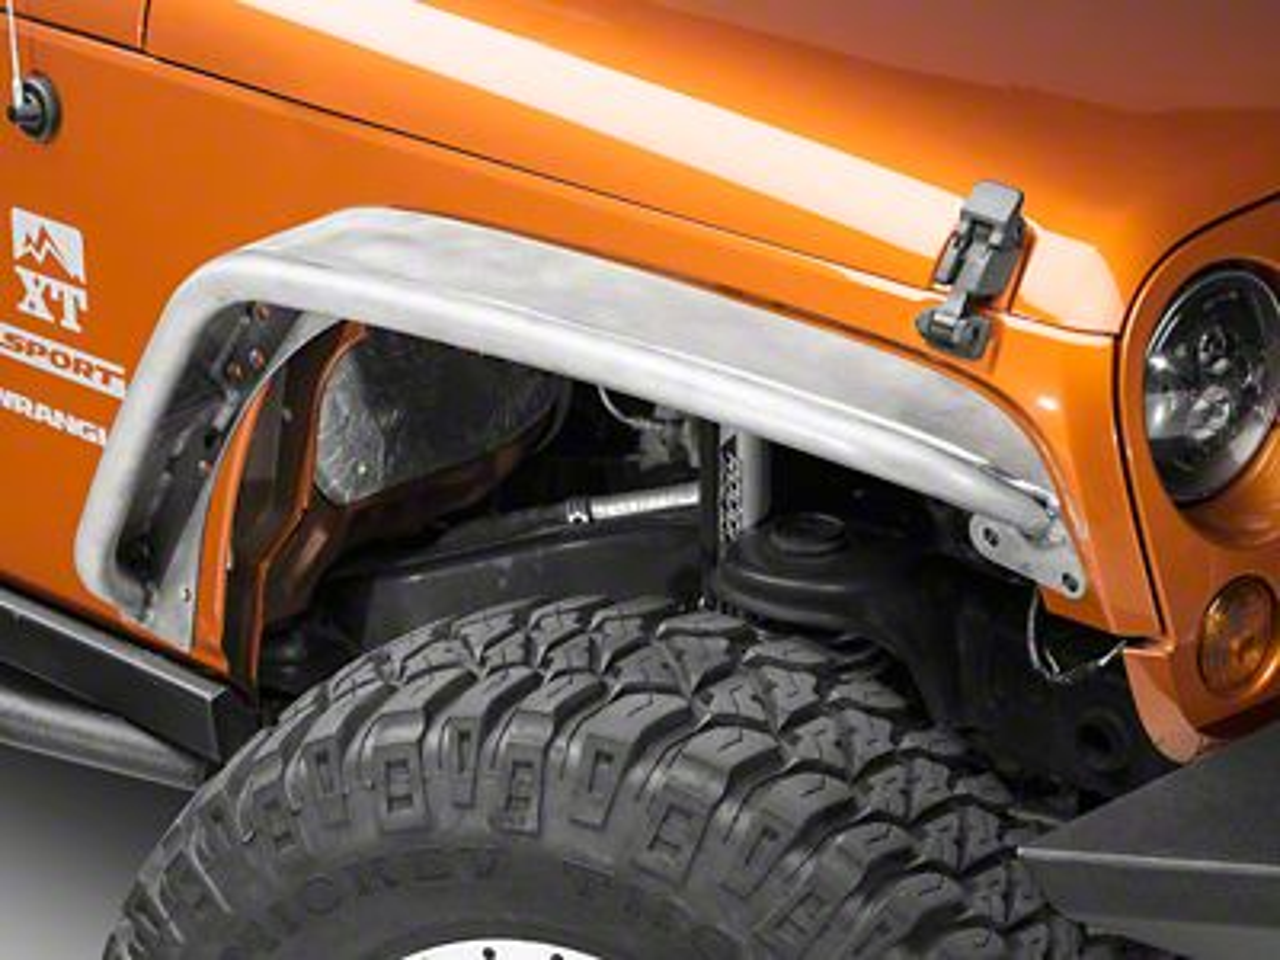 Poison Spyder Narrow Width/Standard Width Crusher Fender Flares - Bare Aluminum (07-18 Jeep Wrangler JK)